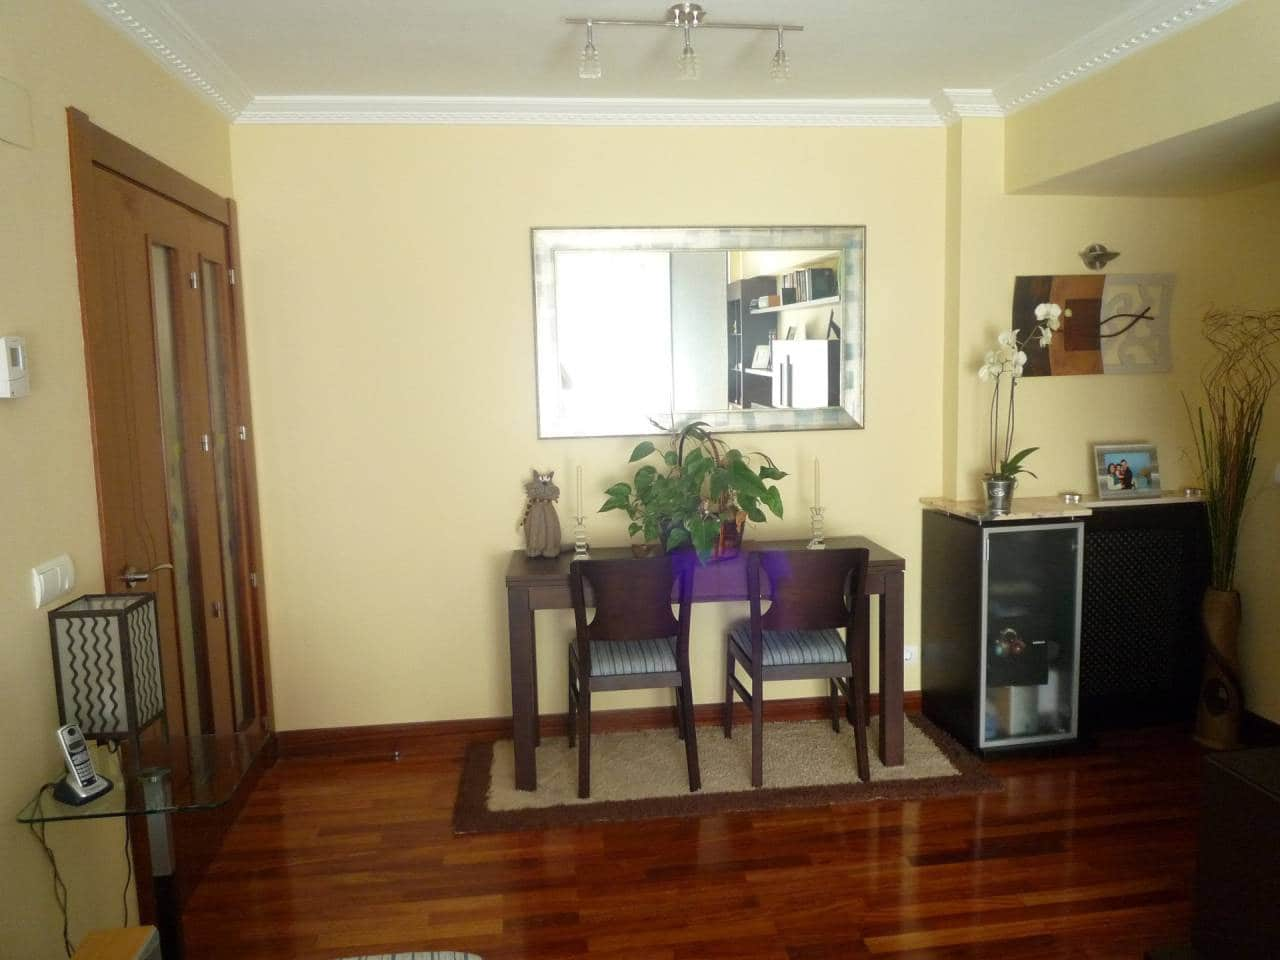 3 chambre Appartement à vendre à Barakaldo - 235 000 € (Ref: 4149915)